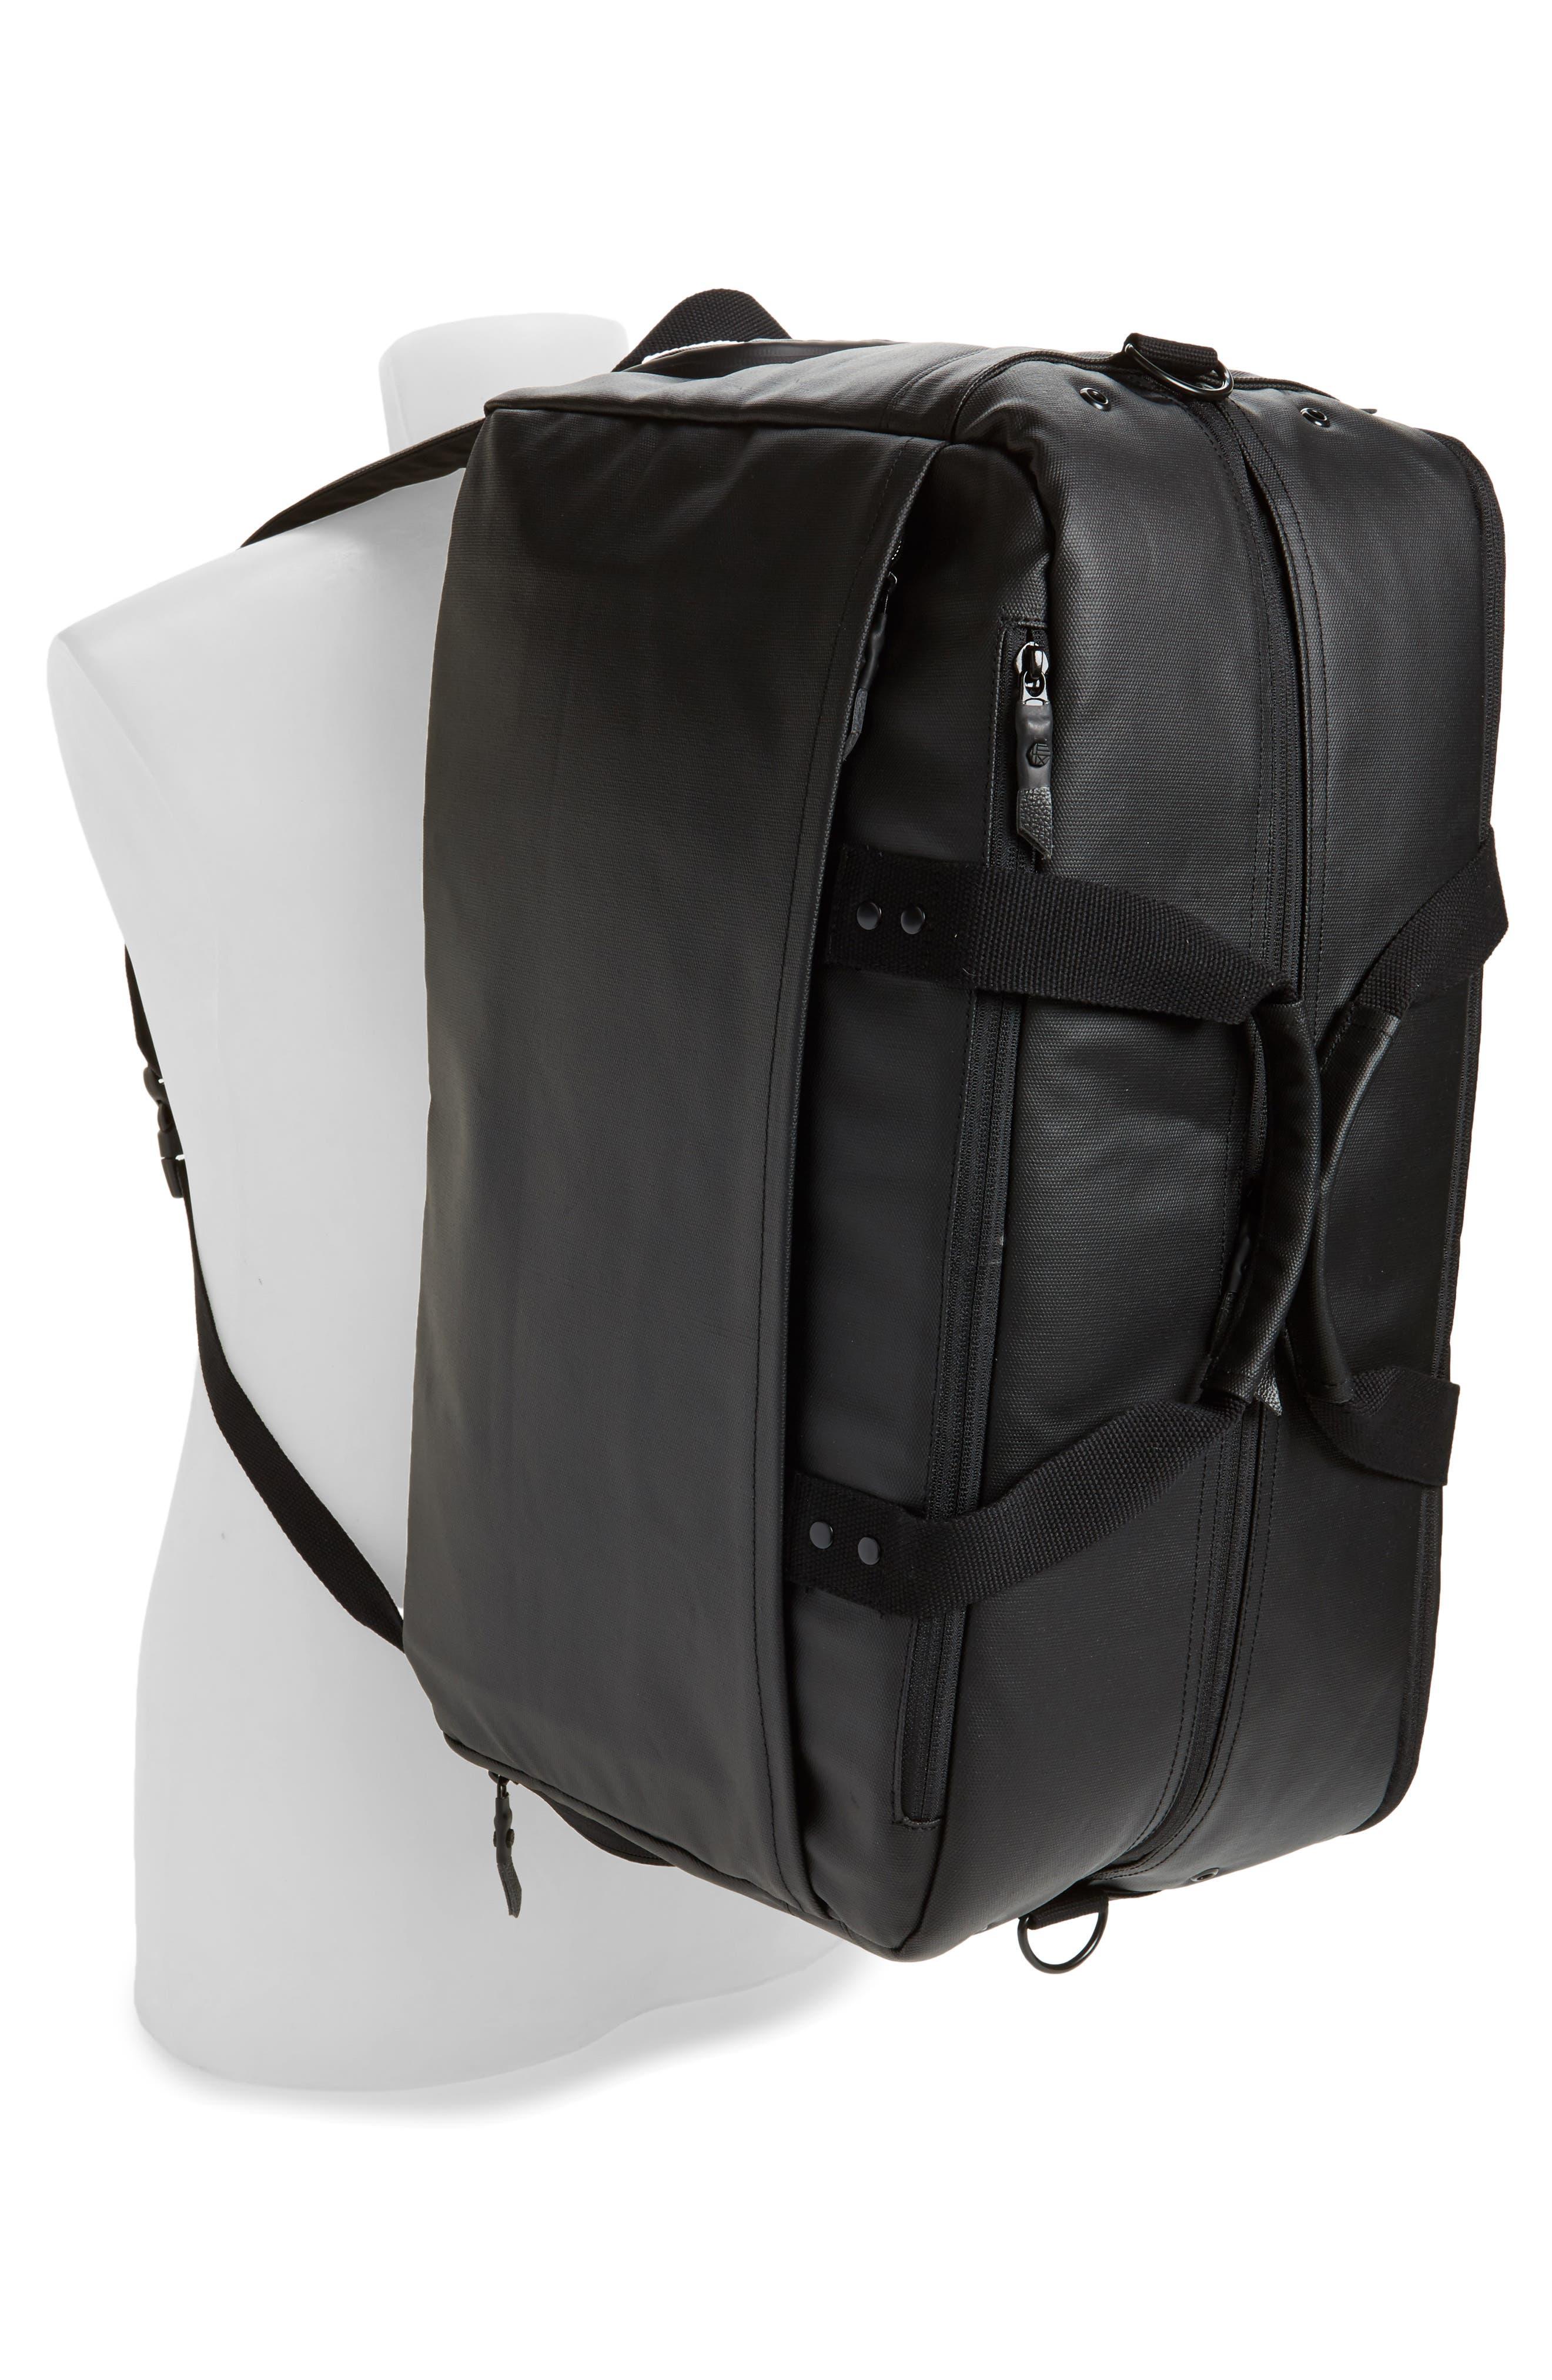 Convertible Duffel Bag,                             Alternate thumbnail 2, color,                             001